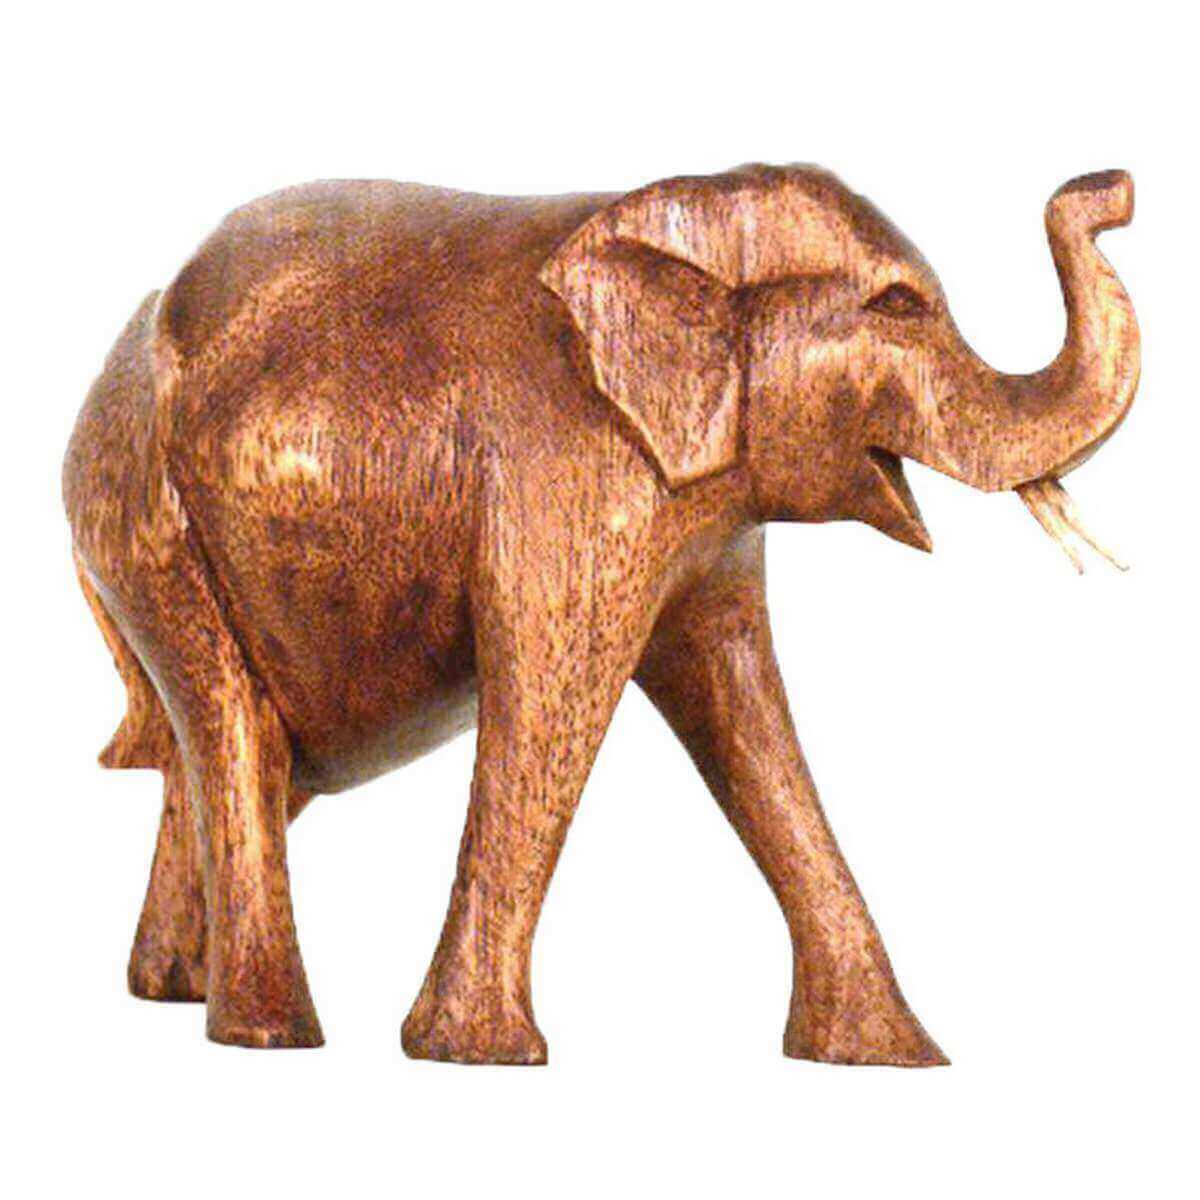 Alte Holzbretter Dekorieren Elegant Elefant Holz Figur Skulptur Abstrakt Holzfigur Statue Afrika asia Glücksbringer Handarbeit Deko